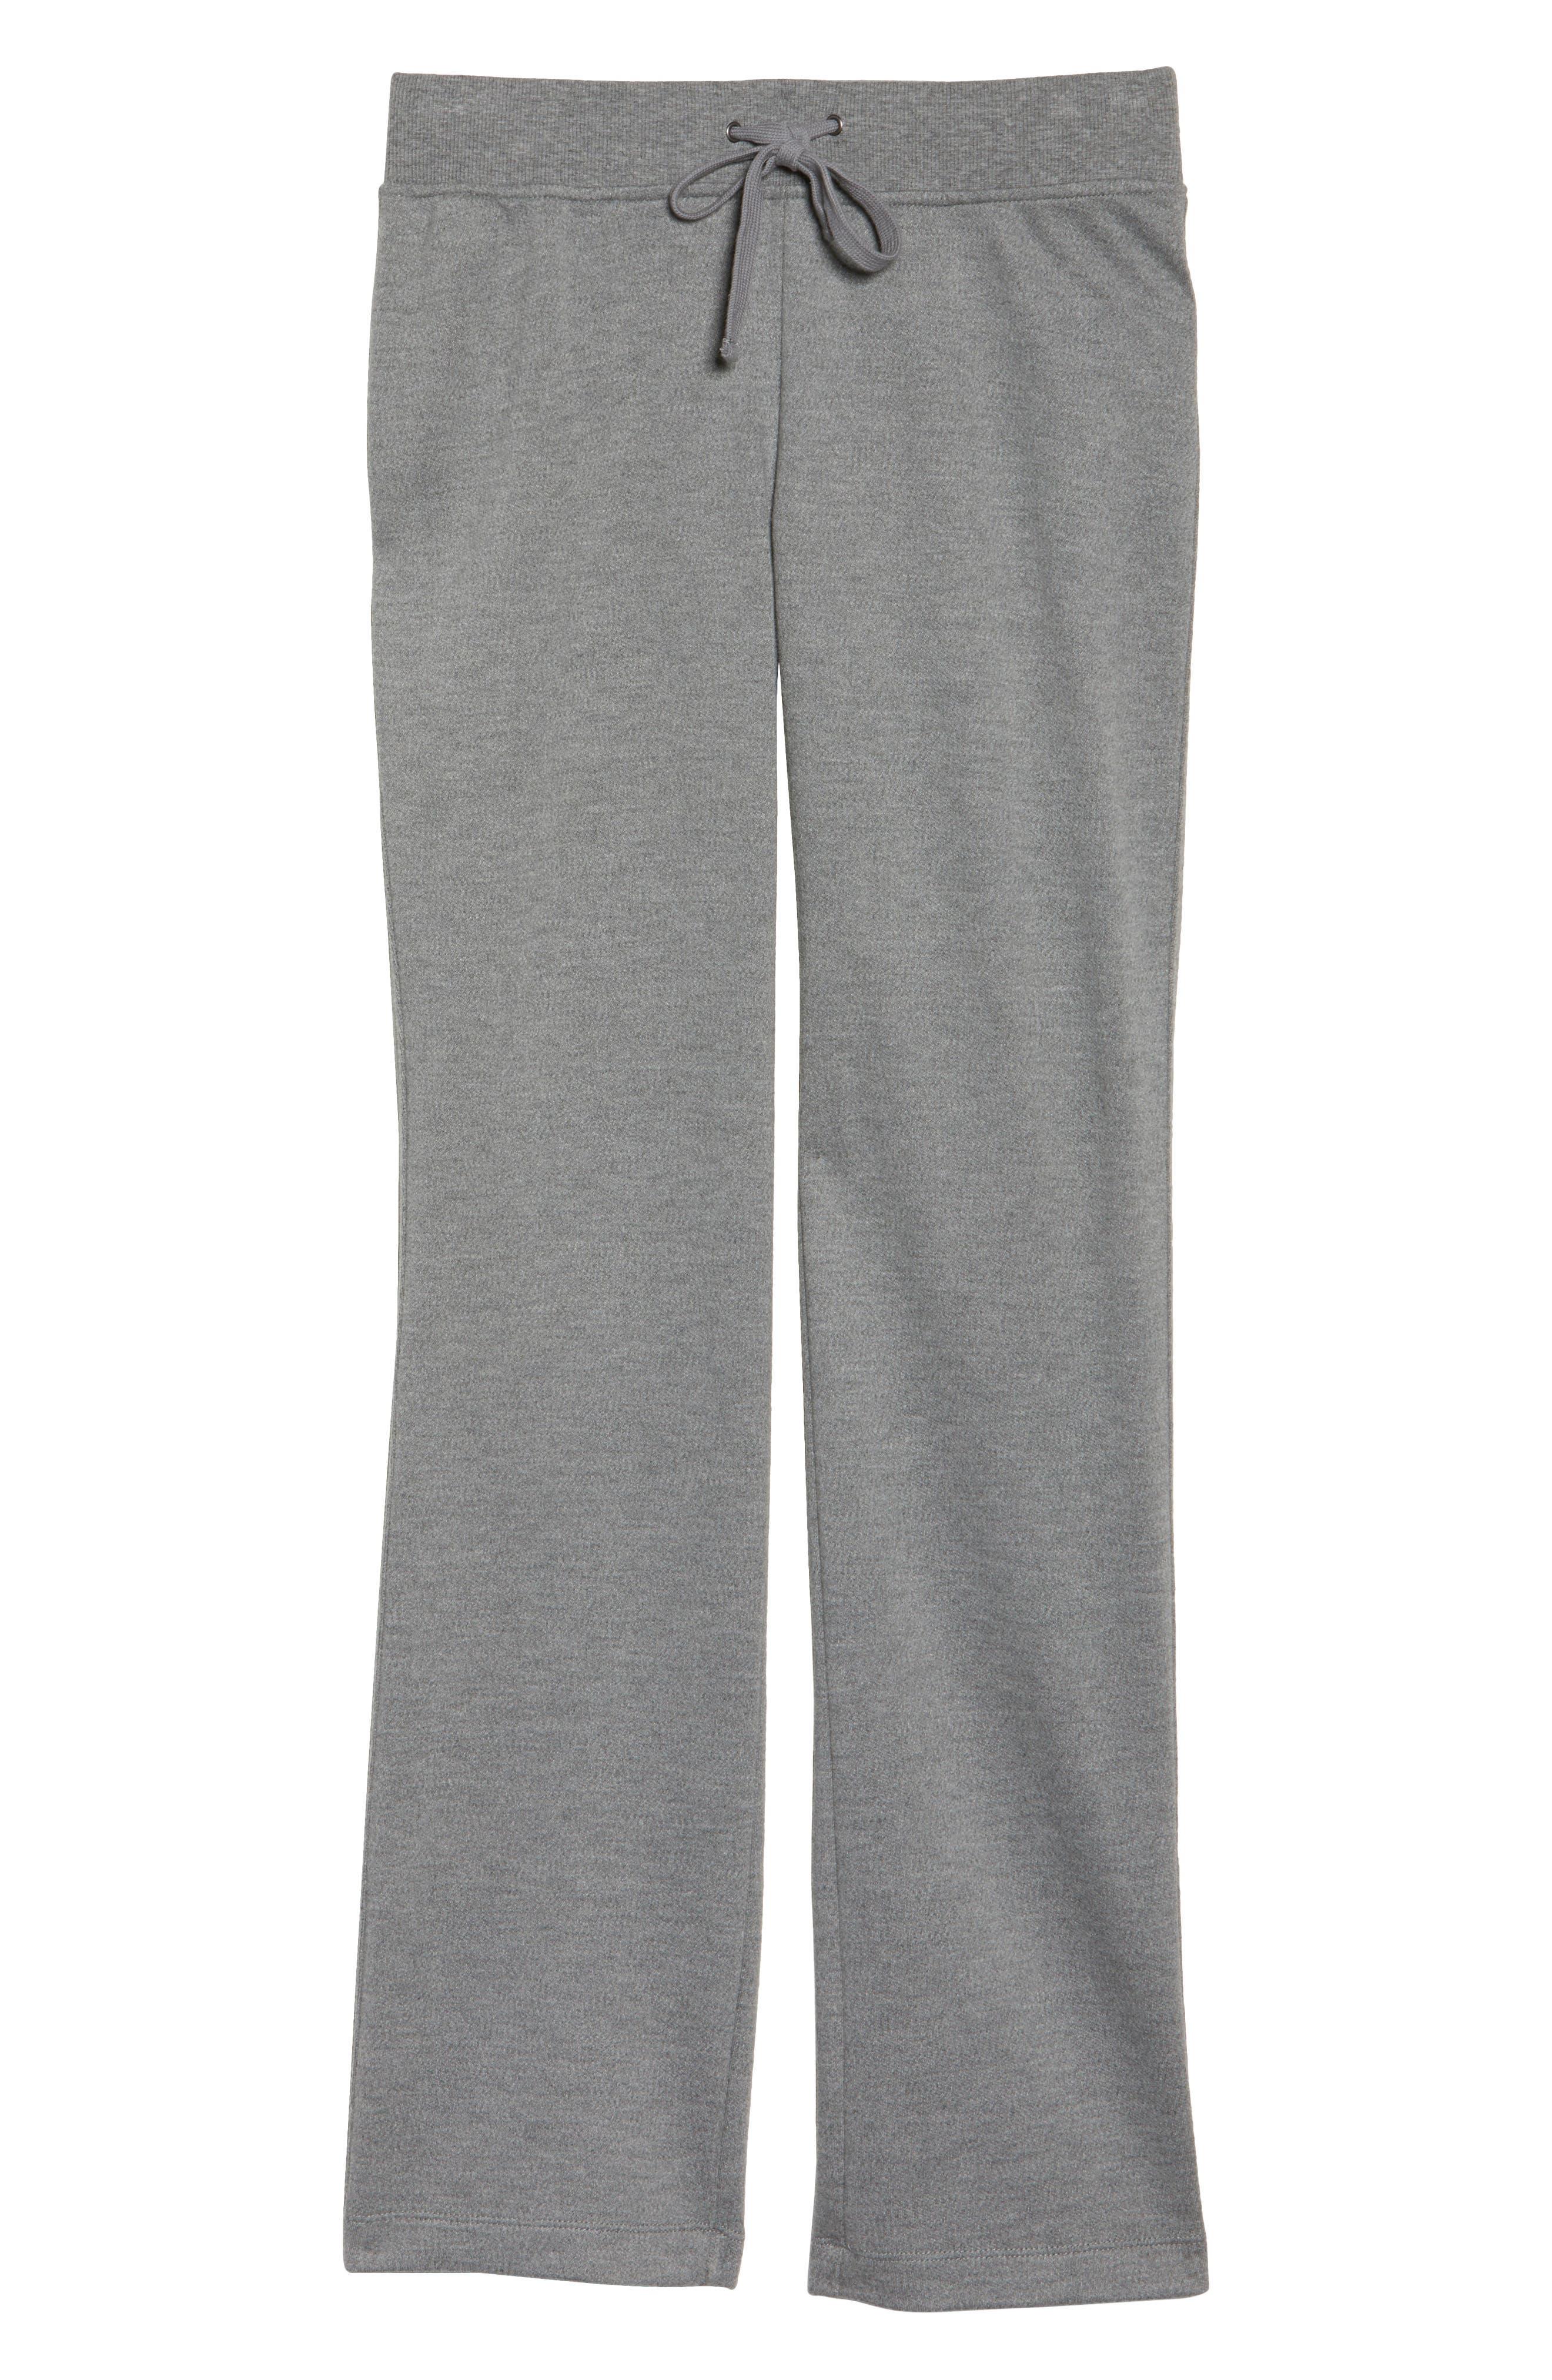 Penny Lounge Pants,                             Alternate thumbnail 6, color,                             GREY HEATHER